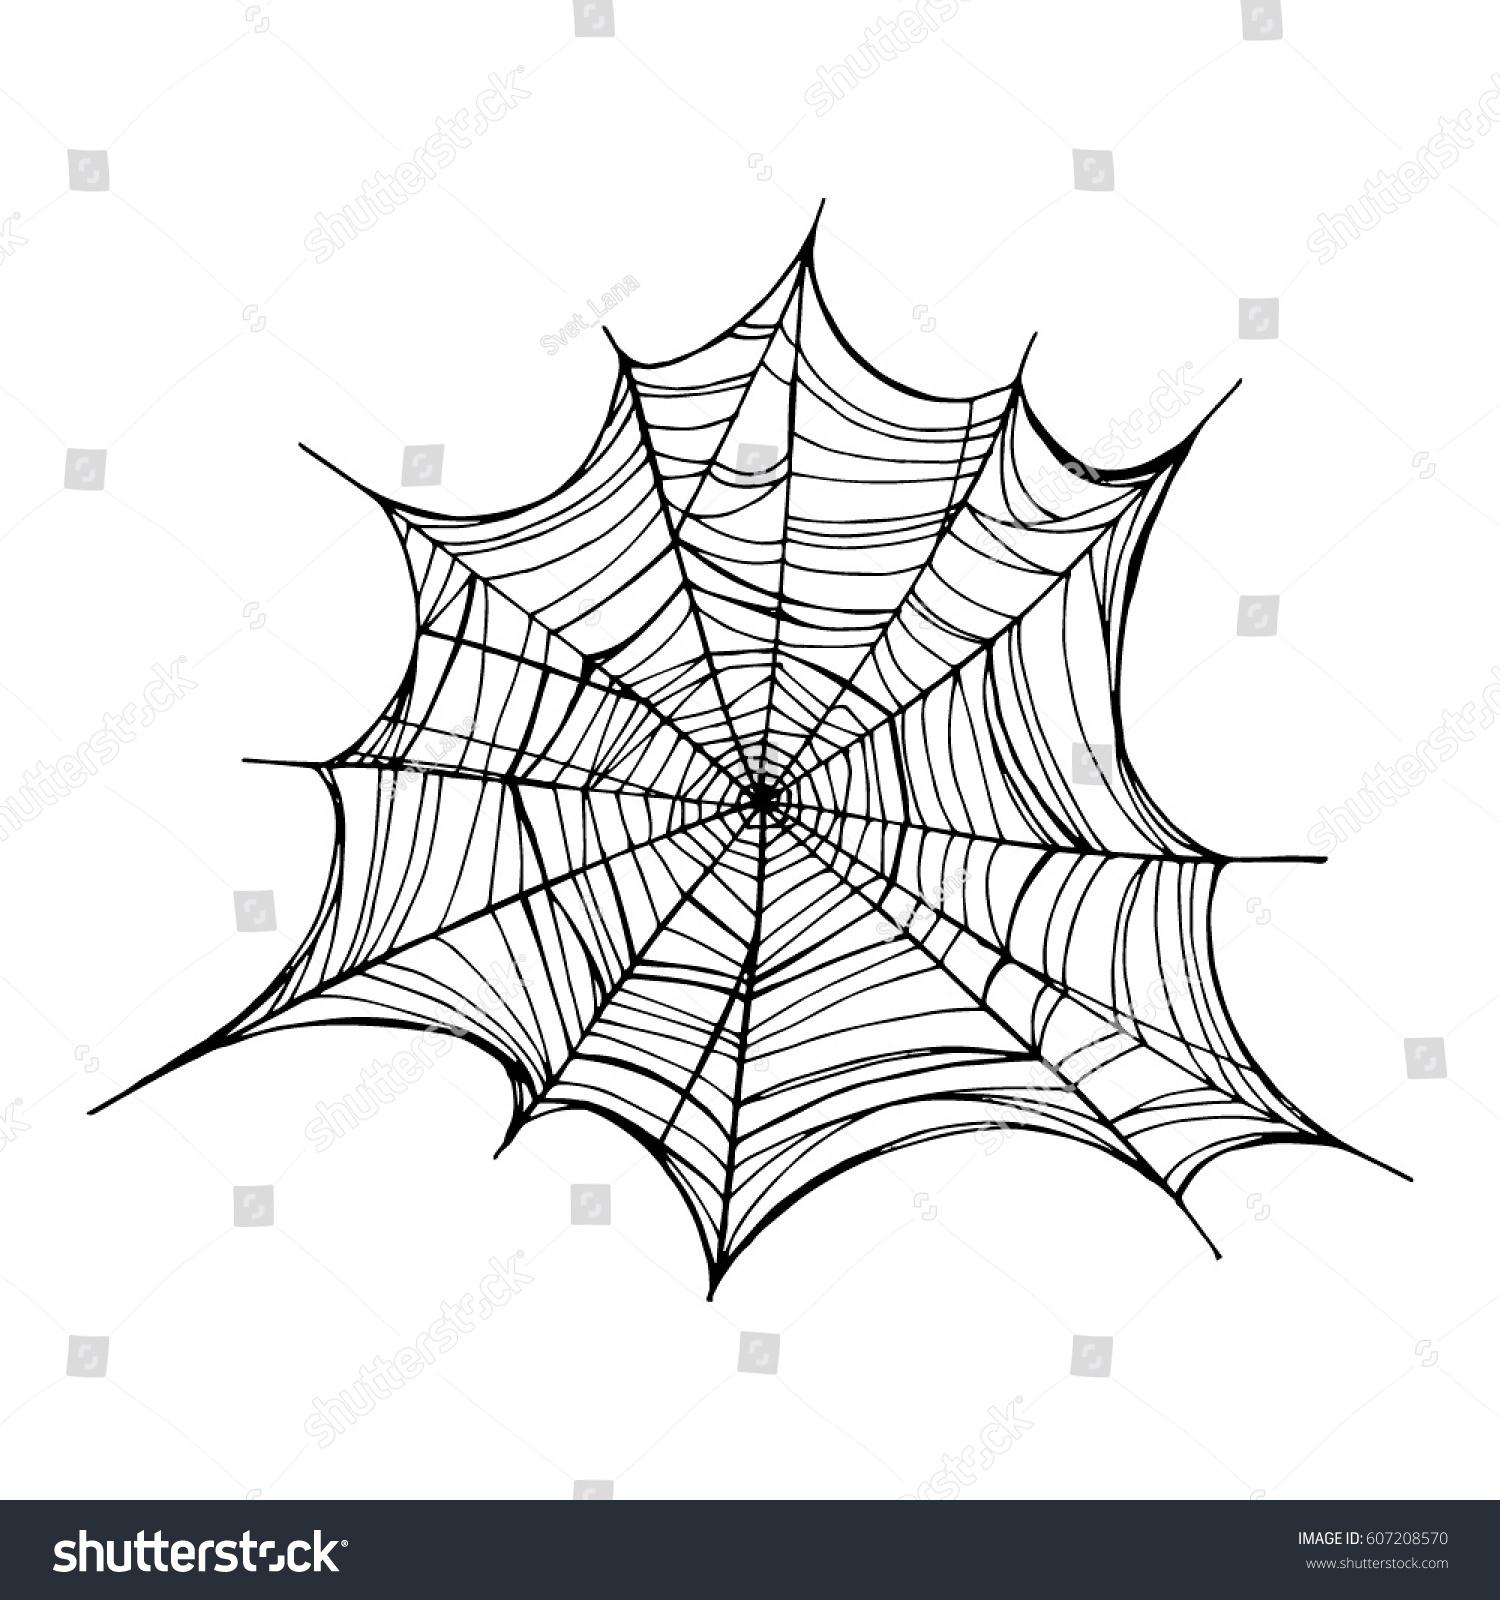 Line Art Website : Spiderweb trap vector illustration isolated web stock